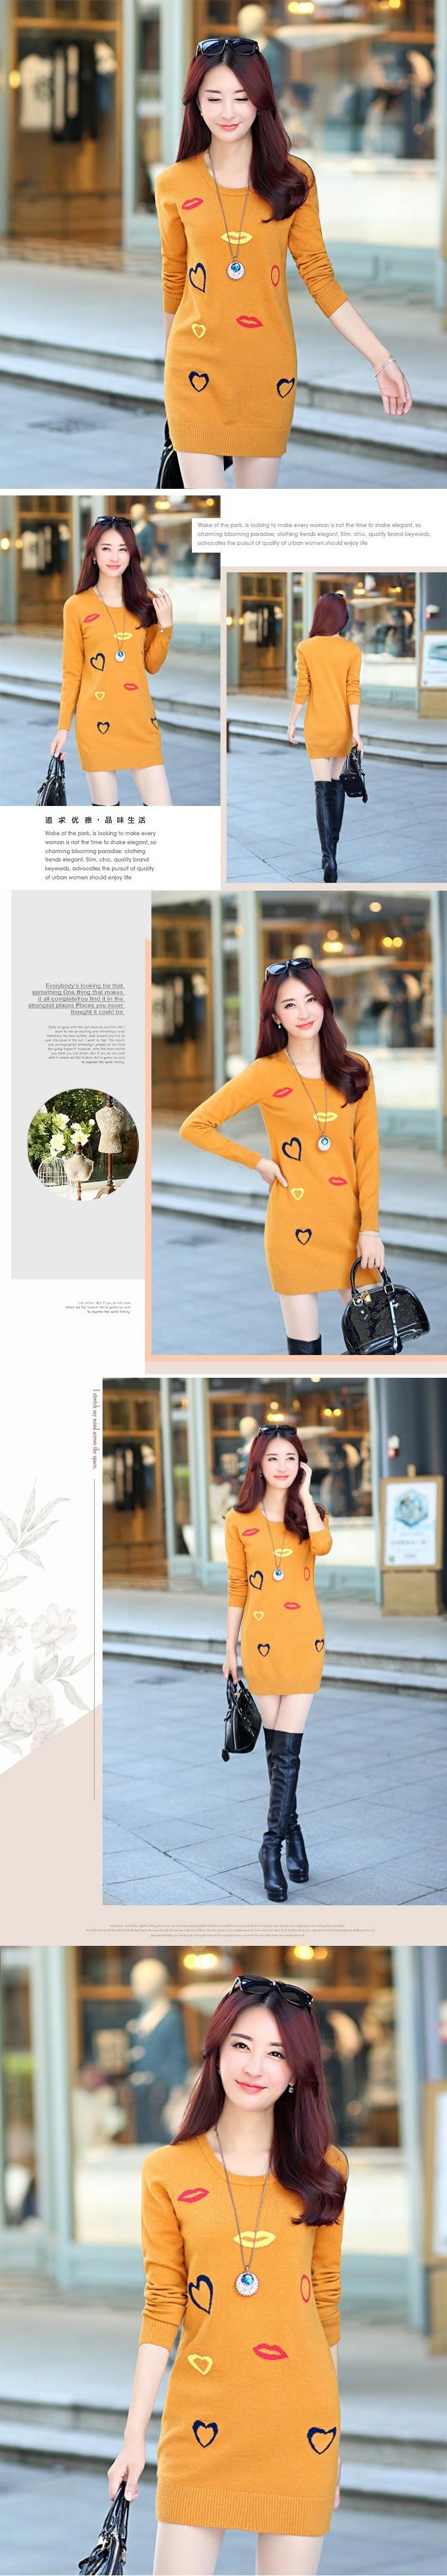 Medium Long Sweater Set head 2016 Latest Fashion Women Winter fall Temperament Leisure Thicken Keep Warm Round collar Knit G1011